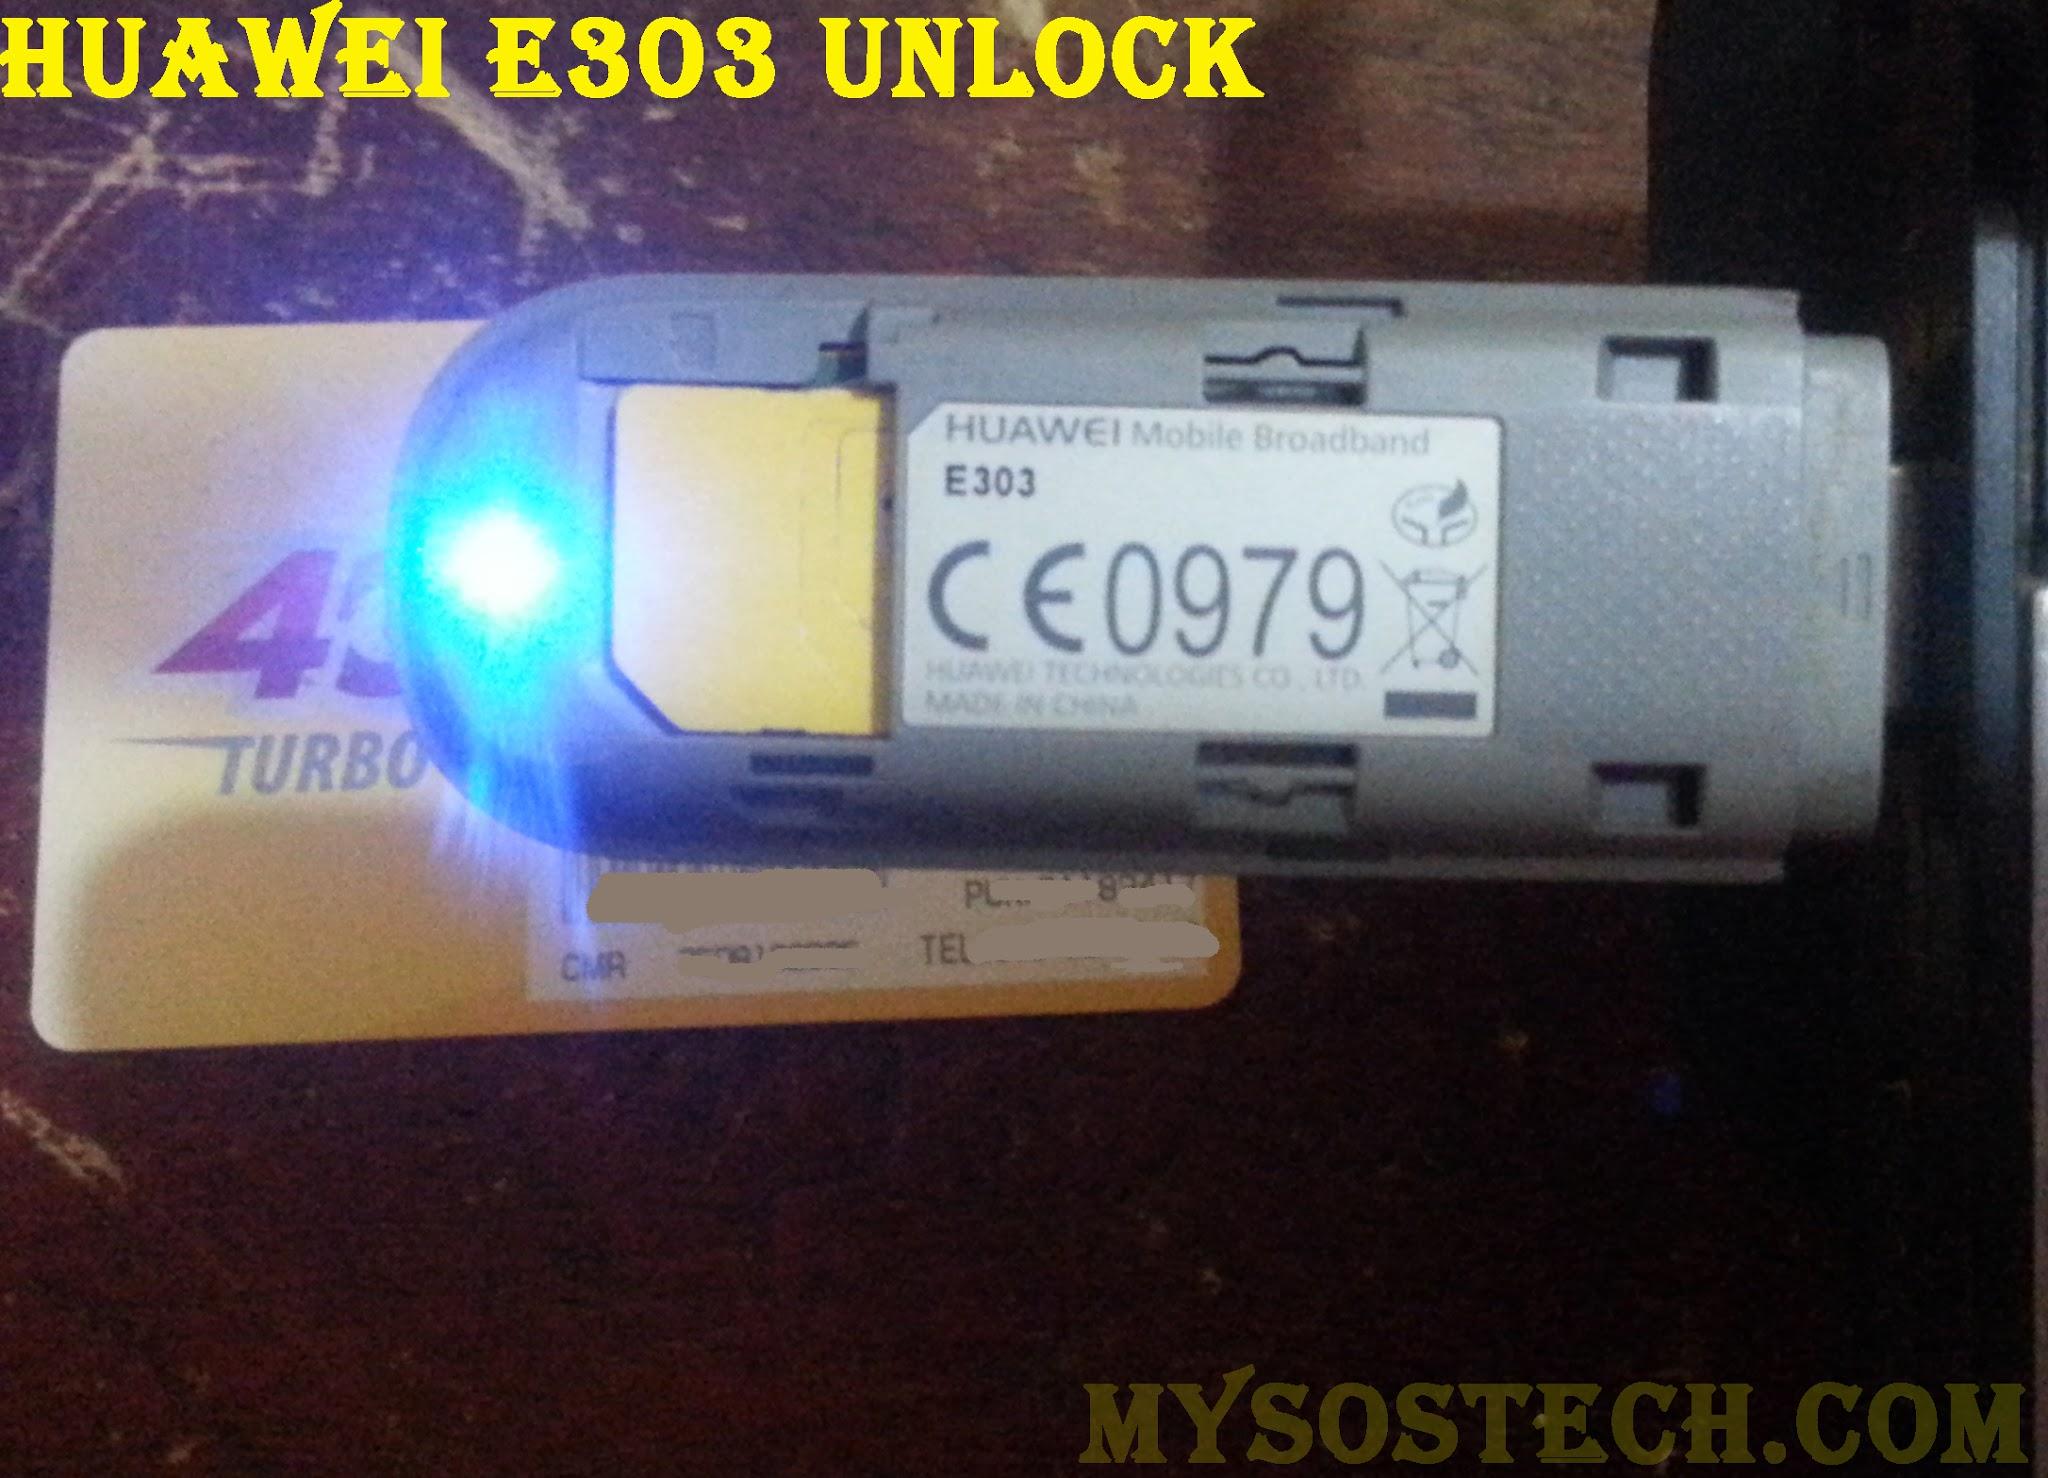 debloquer huawei E303 modem 3g - My Sos Tech